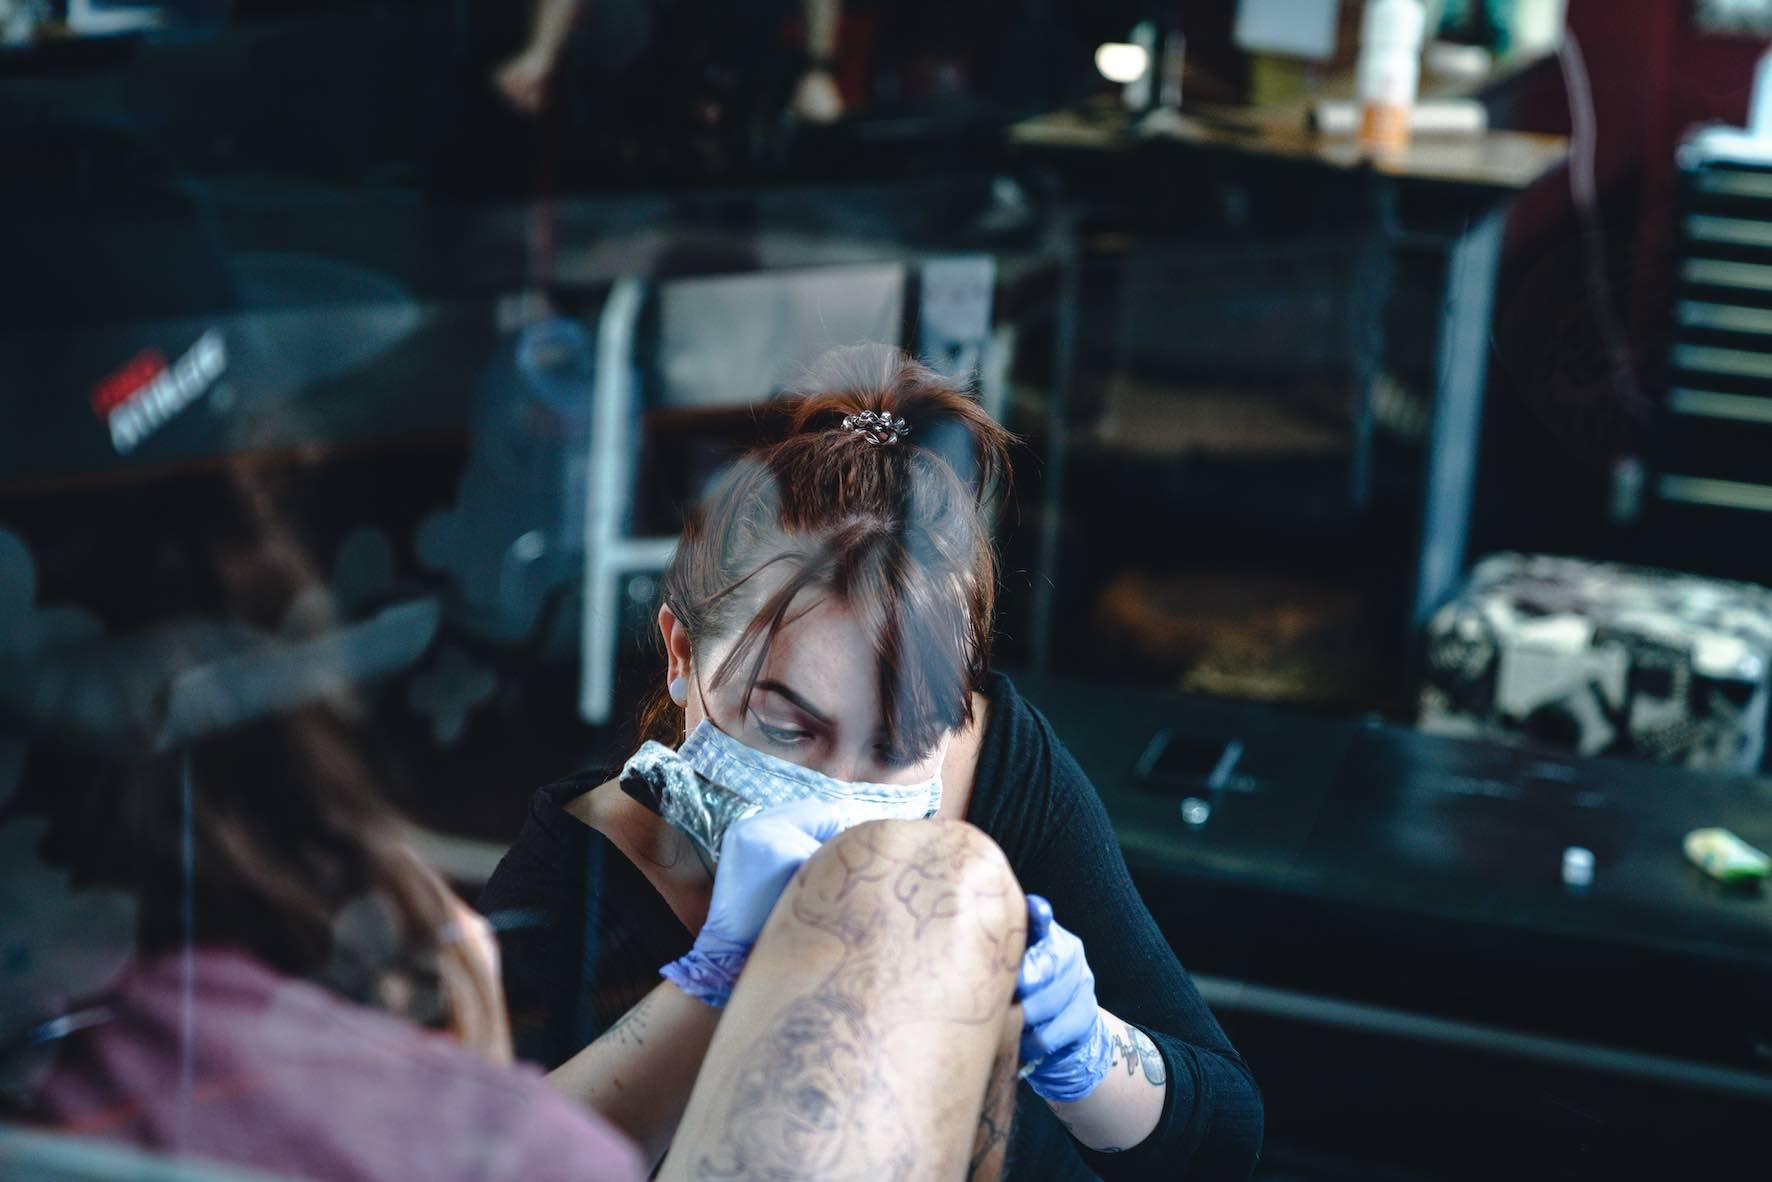 Tarryn Faye Brummage tattooing our of Ting's Tattoo Studio